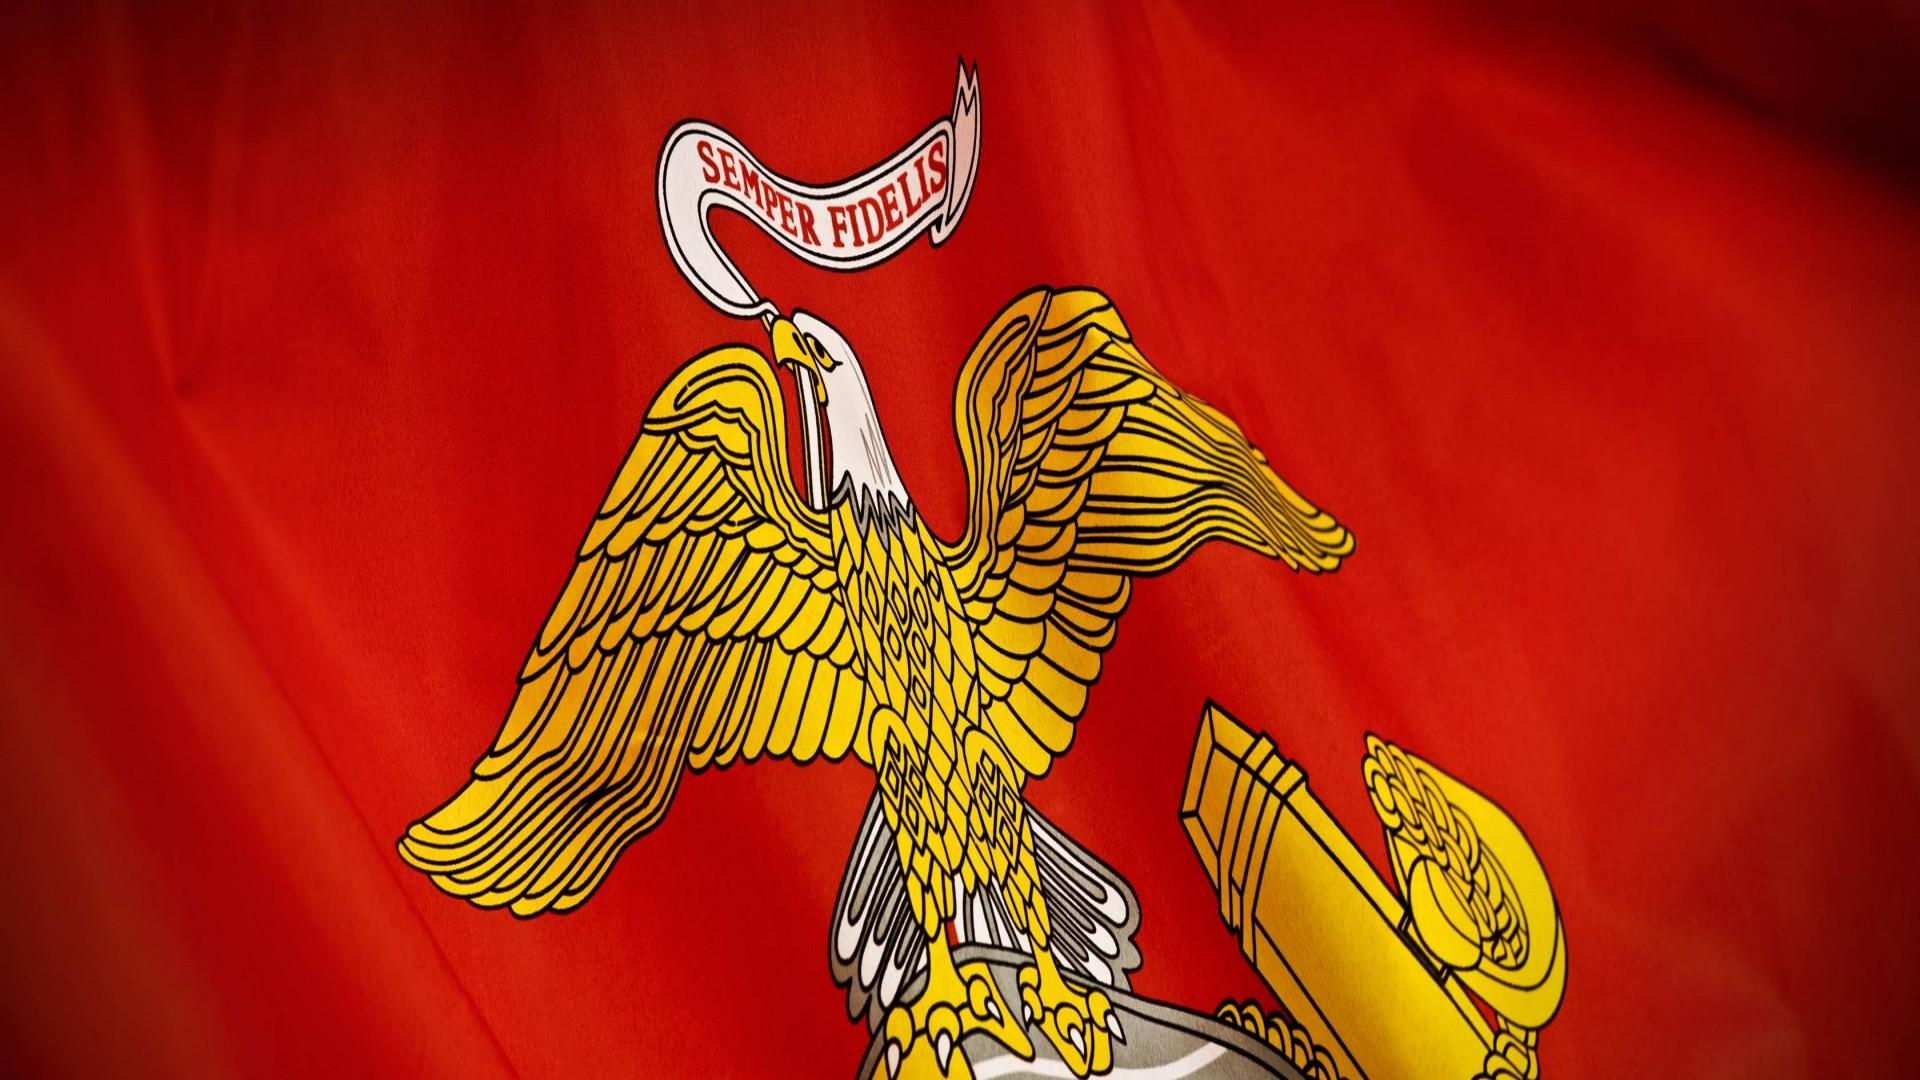 US Marine Corps Logo Wallpaper (48+ images)